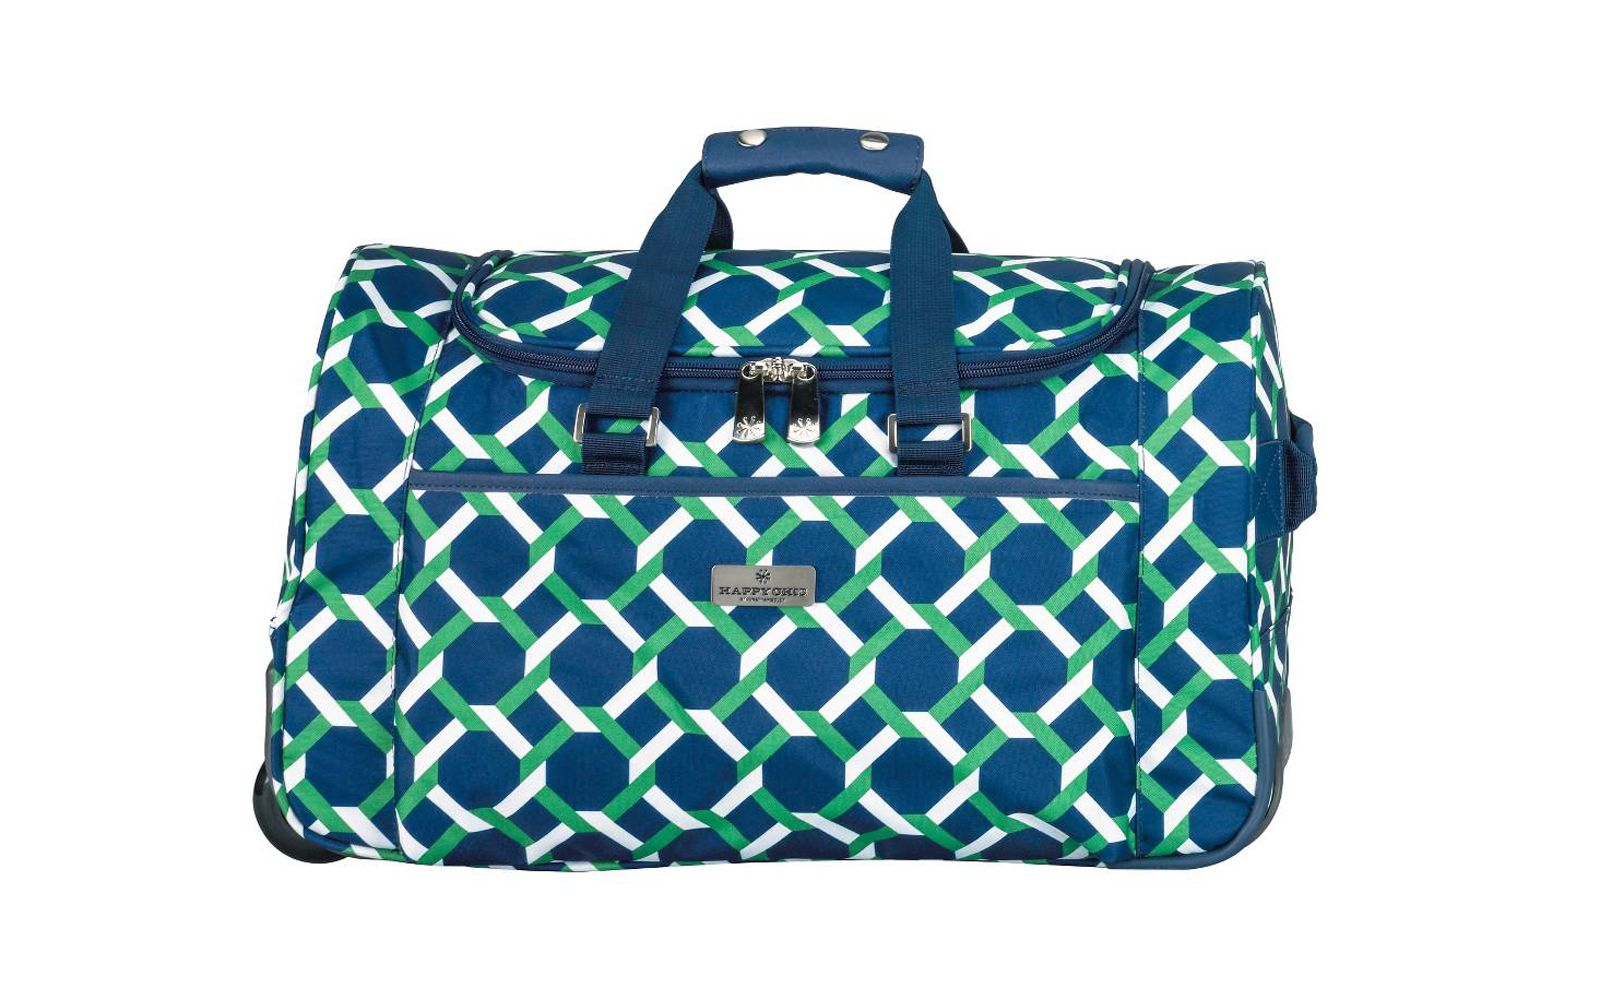 79897ba705f Happy Chic by Jonathan Adler Rolling Duffel Bag in Green Navy Lattice